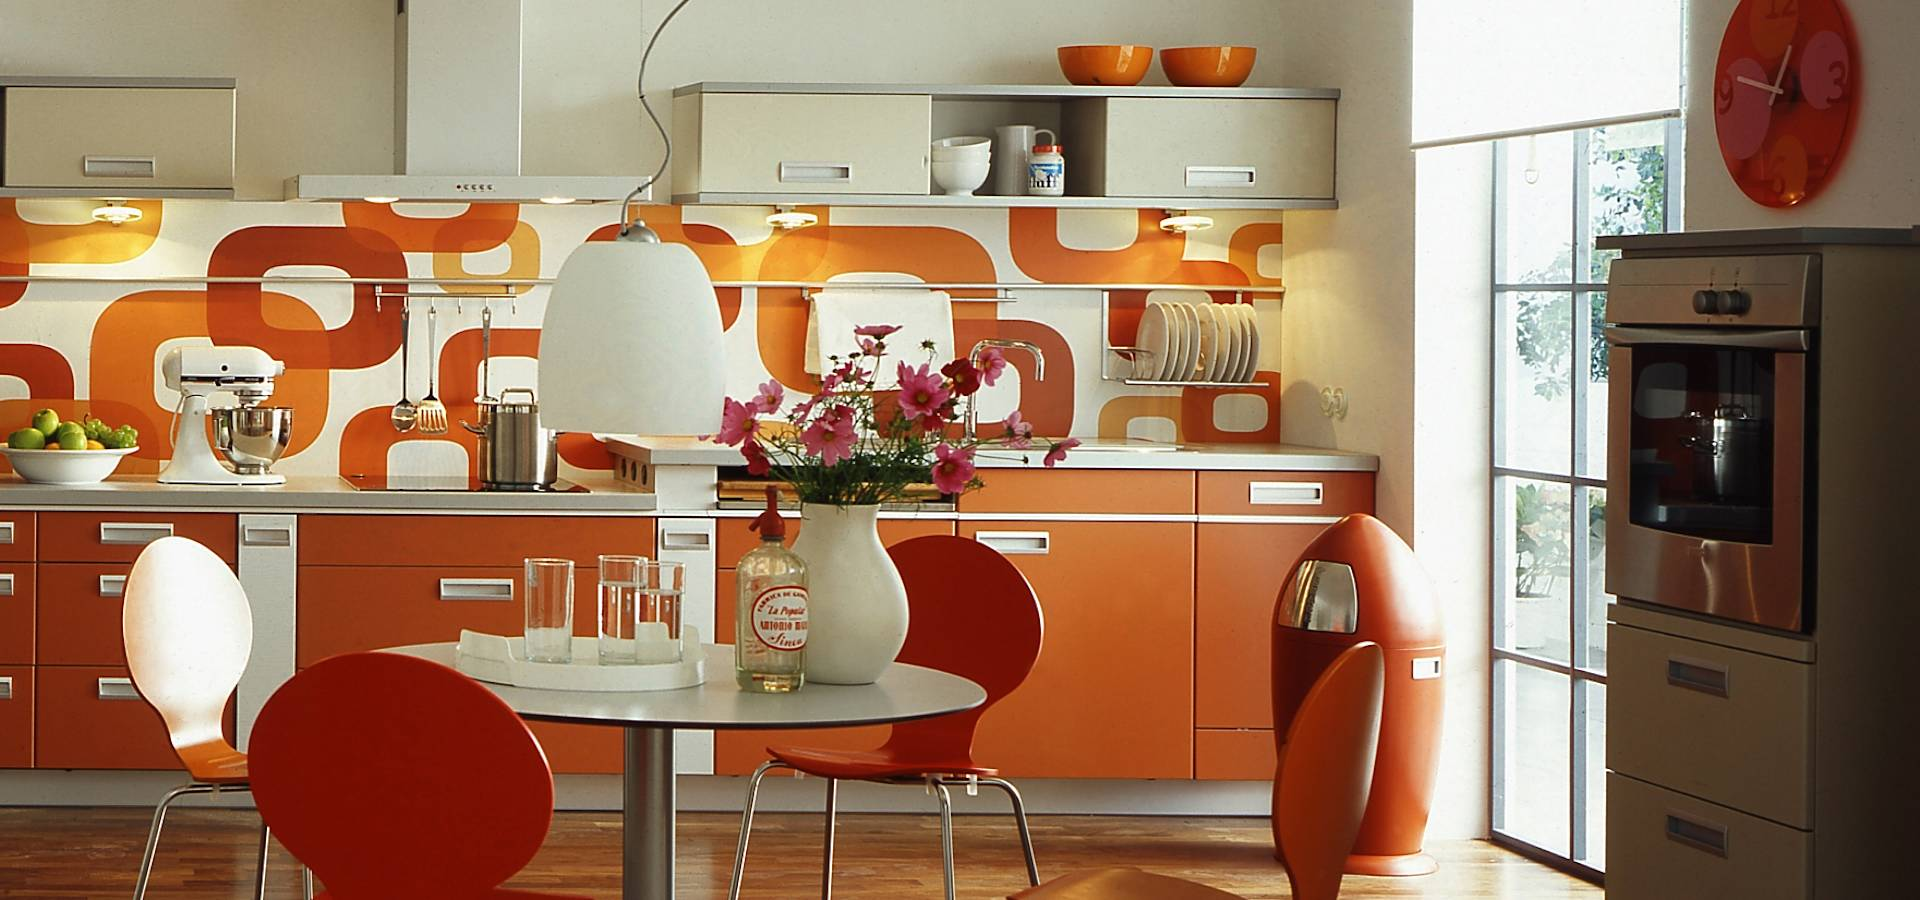 Inken Voss Design